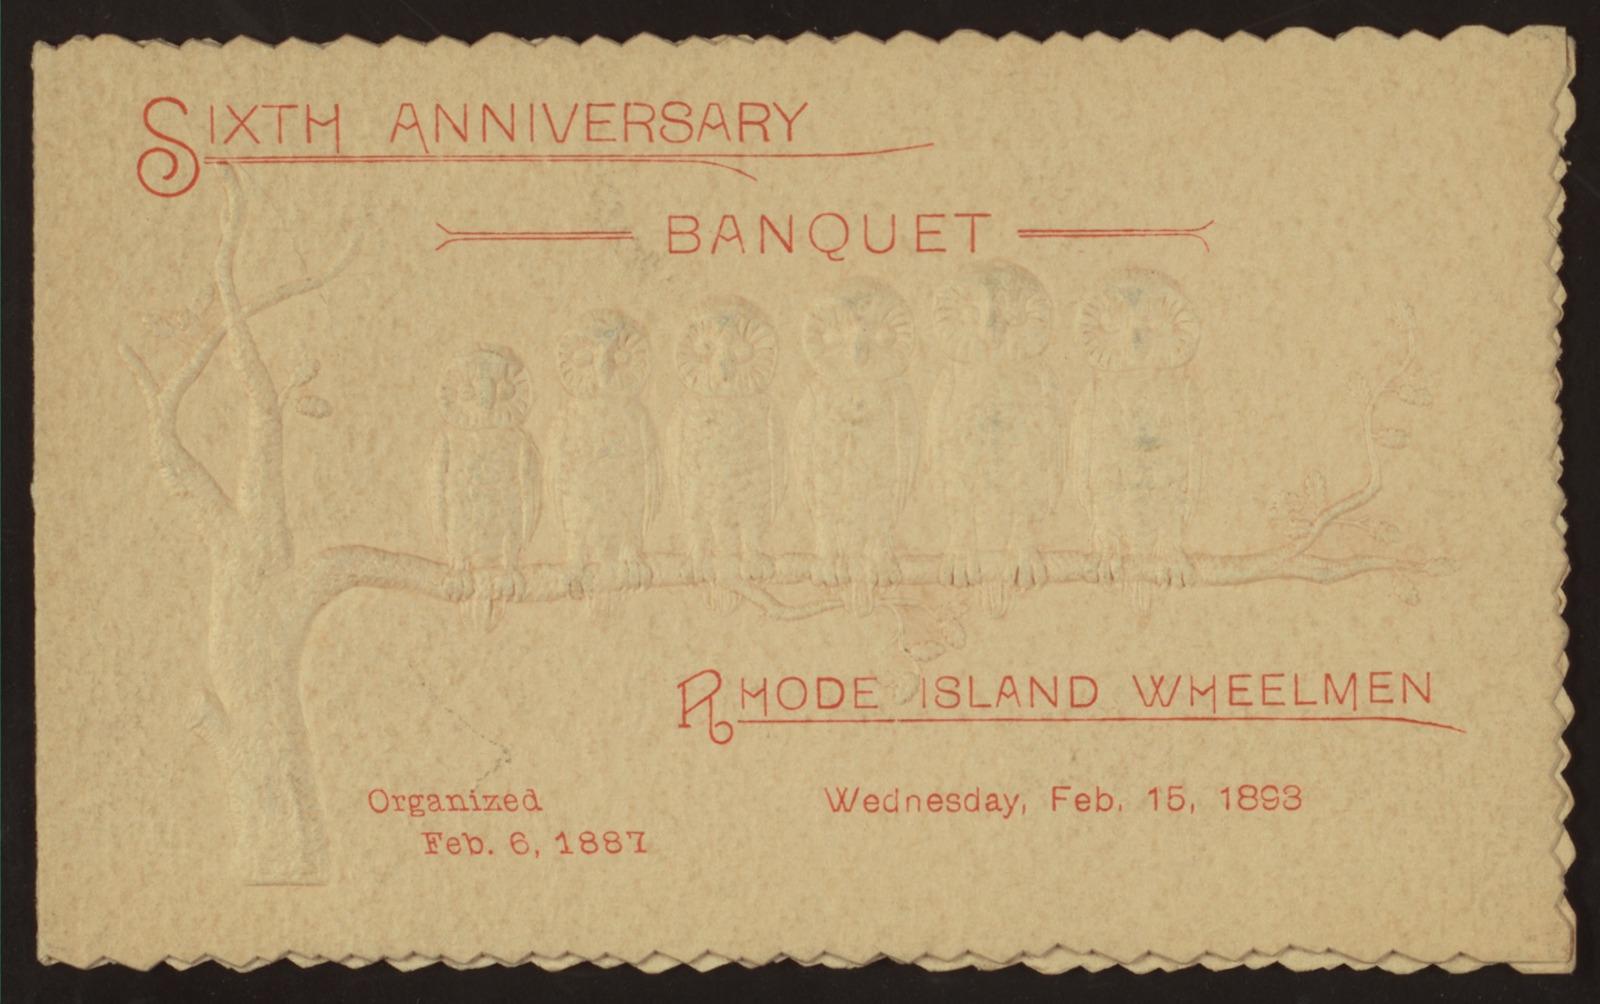 SIXTH ANNIVERSARY BANQUET [held by] RHODE ISLAND WHEELMEN [at]